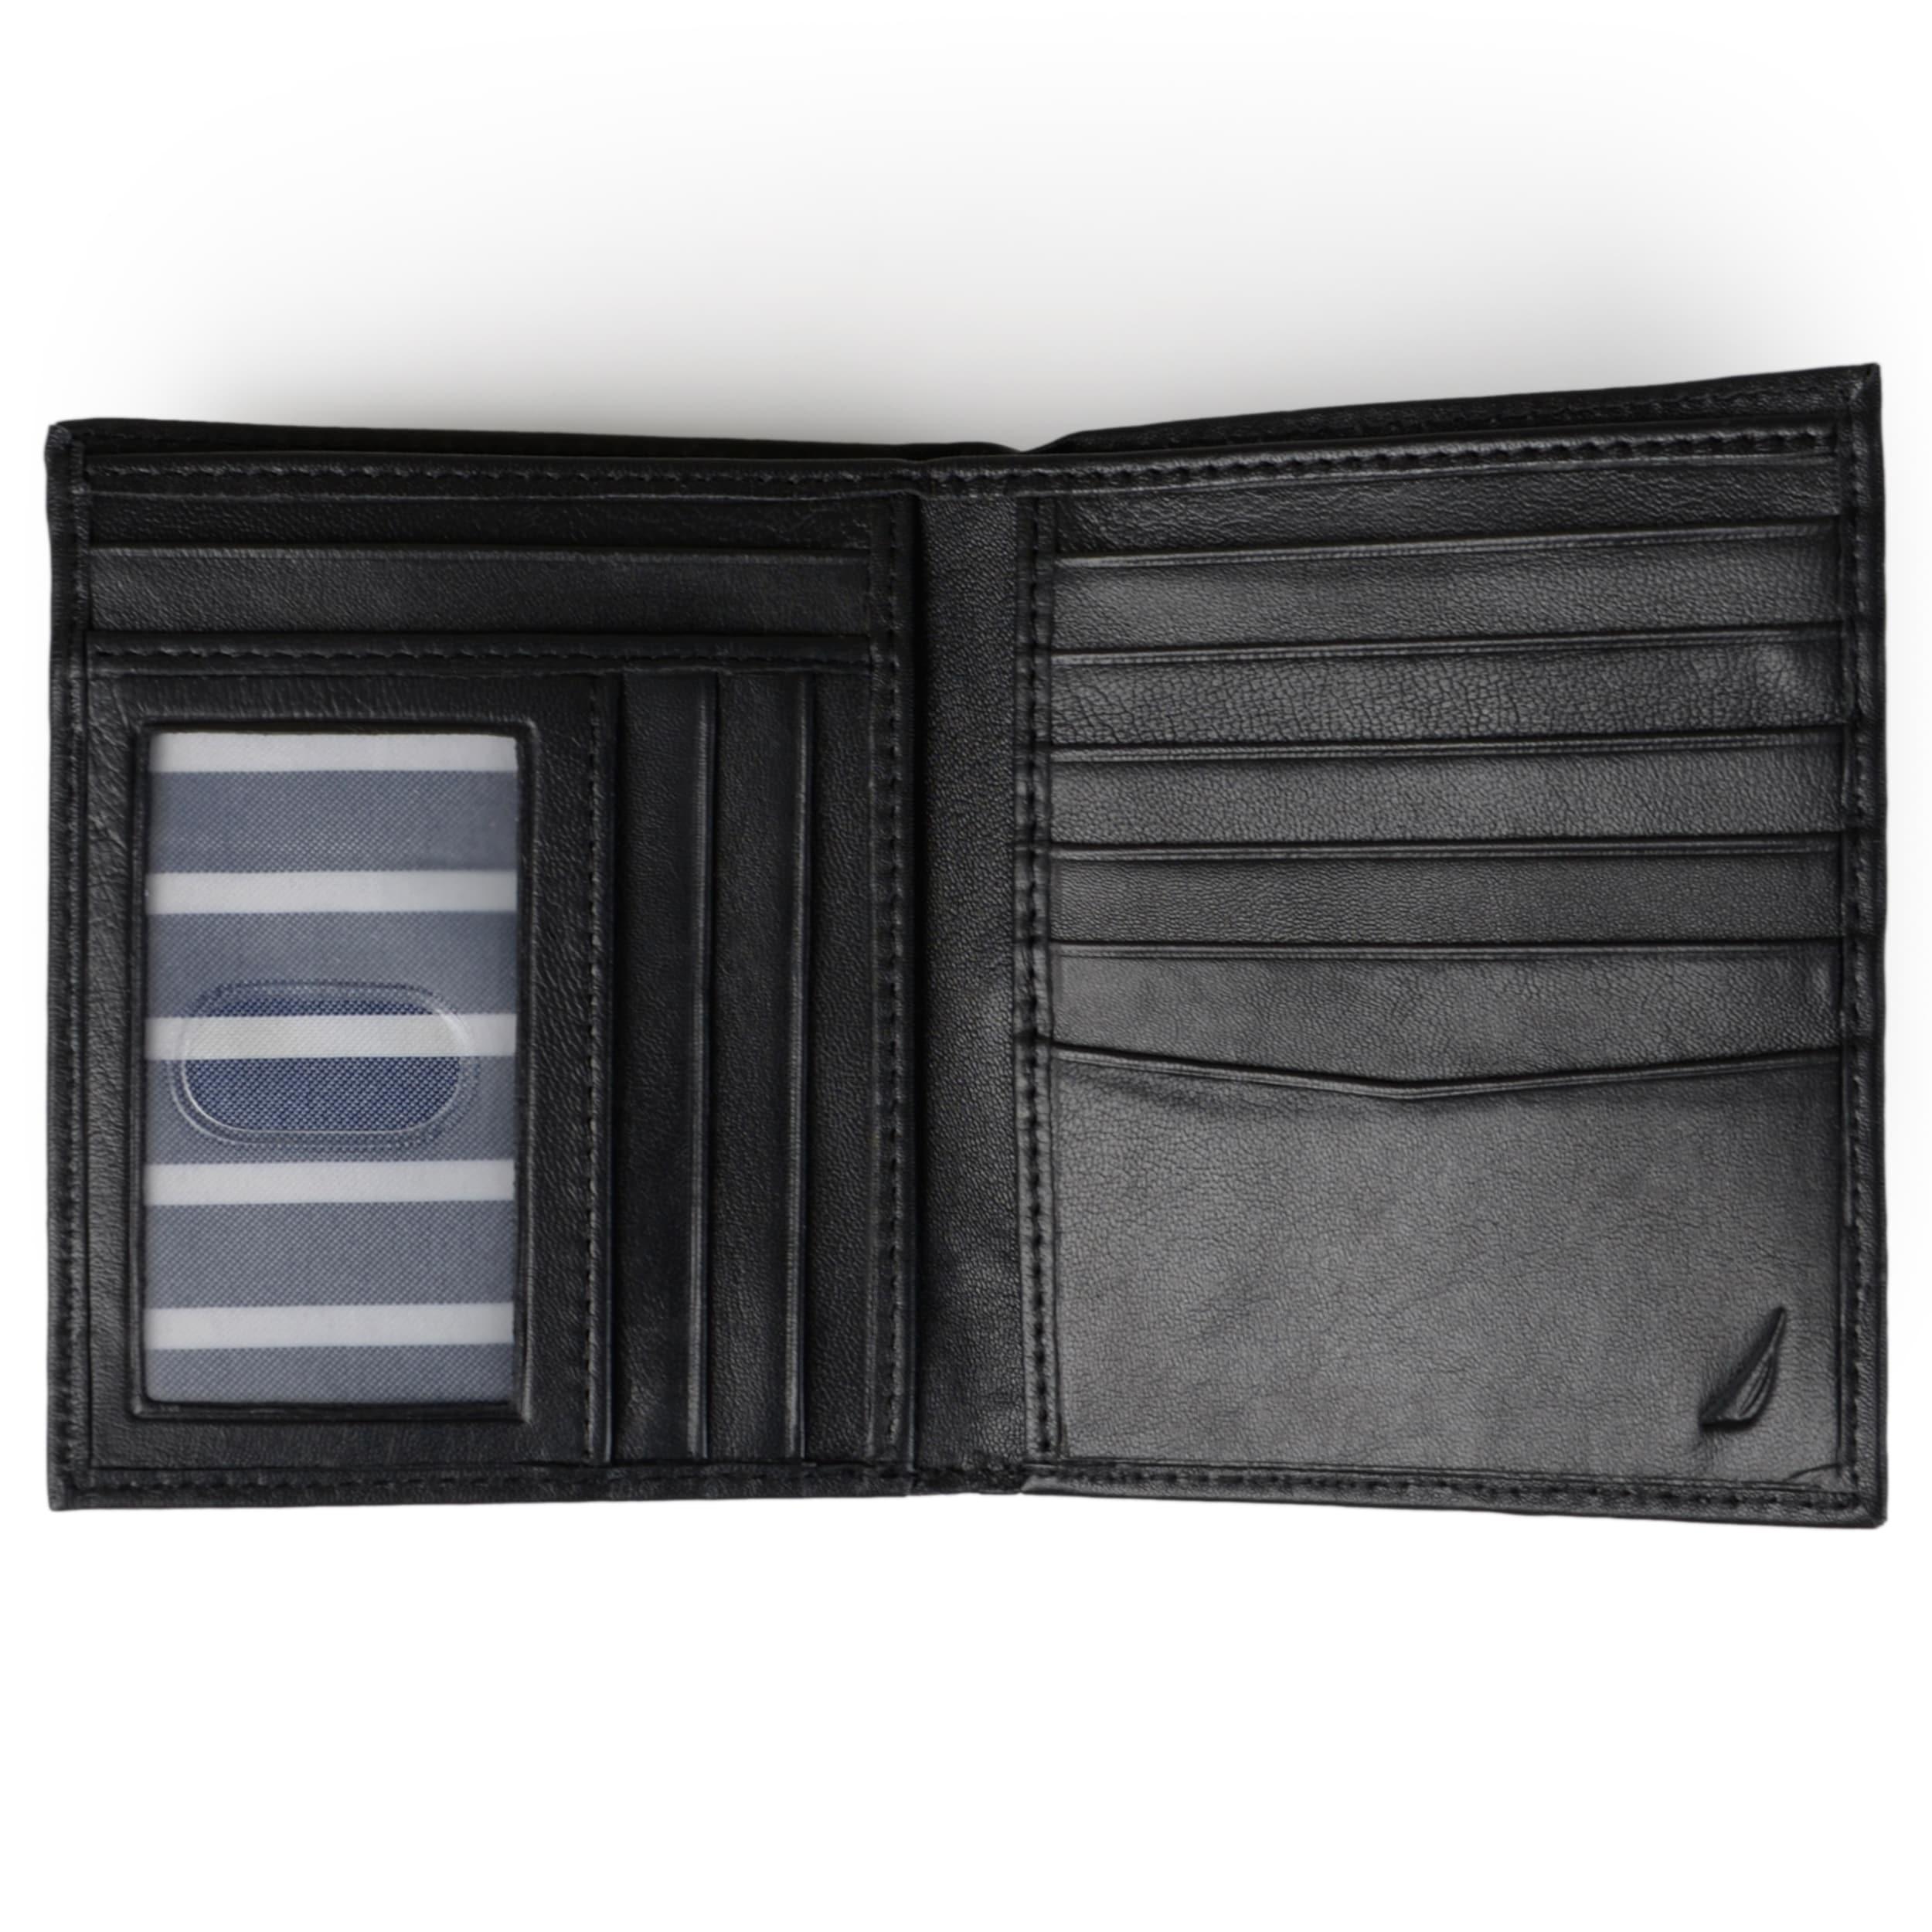 Nautica Men/'s Leather Credit Card ID Organizer Big Designer Wallet 31NU19X003